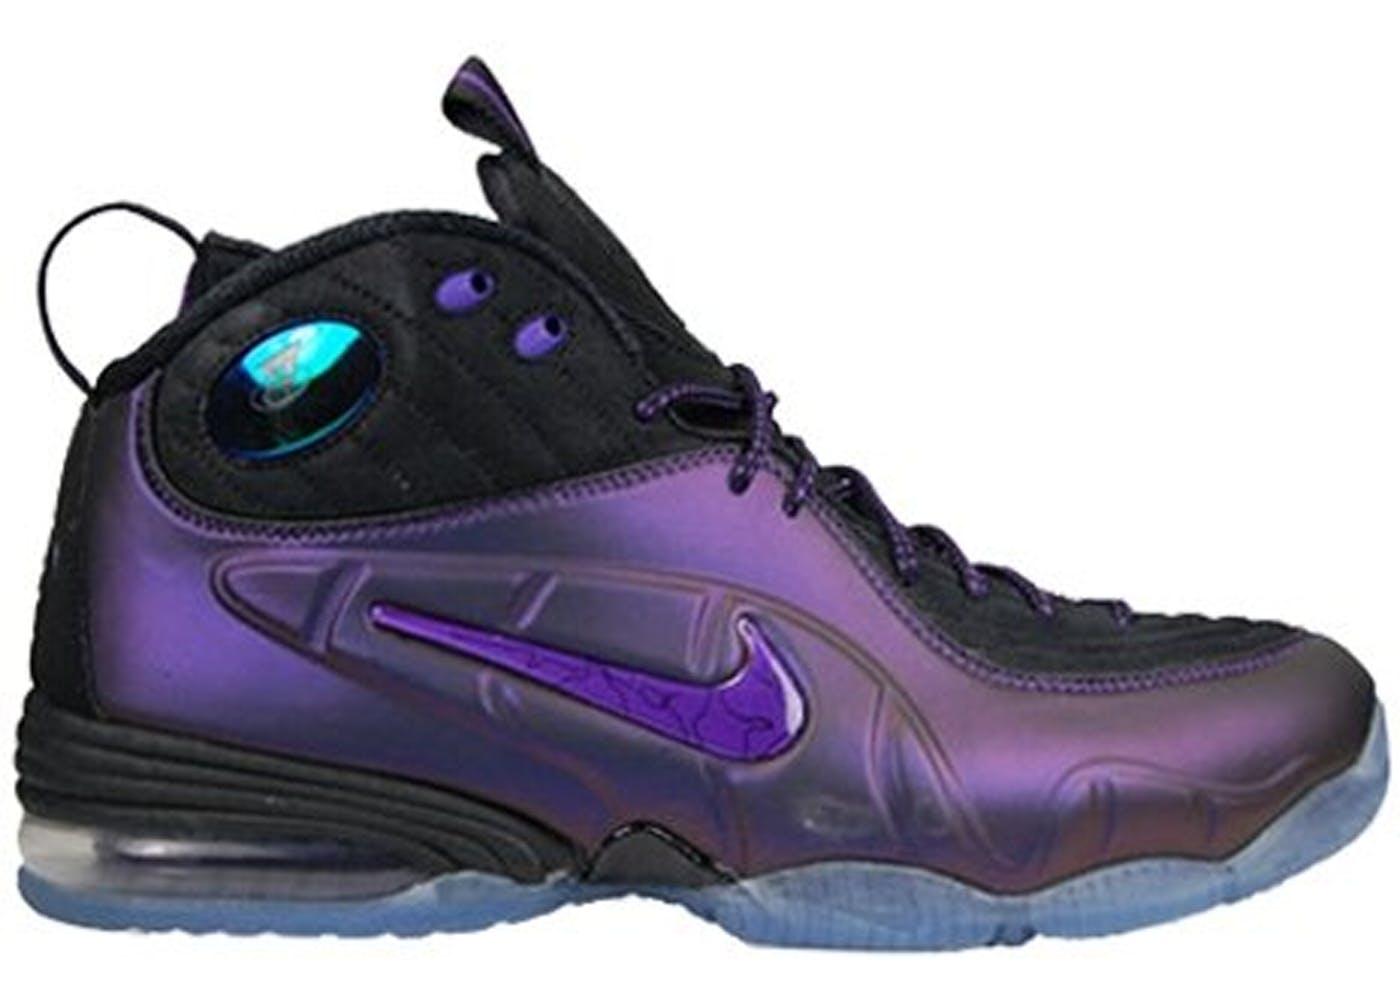 hot sale online 3a74e 042e2 ... Nike Basketball Penny Most Expensive, Size 4 eBay Marketplace Logo ... Nike  Air 12 Cent Penny Hardaway Eggplant - Club PurpleClub Purple- .